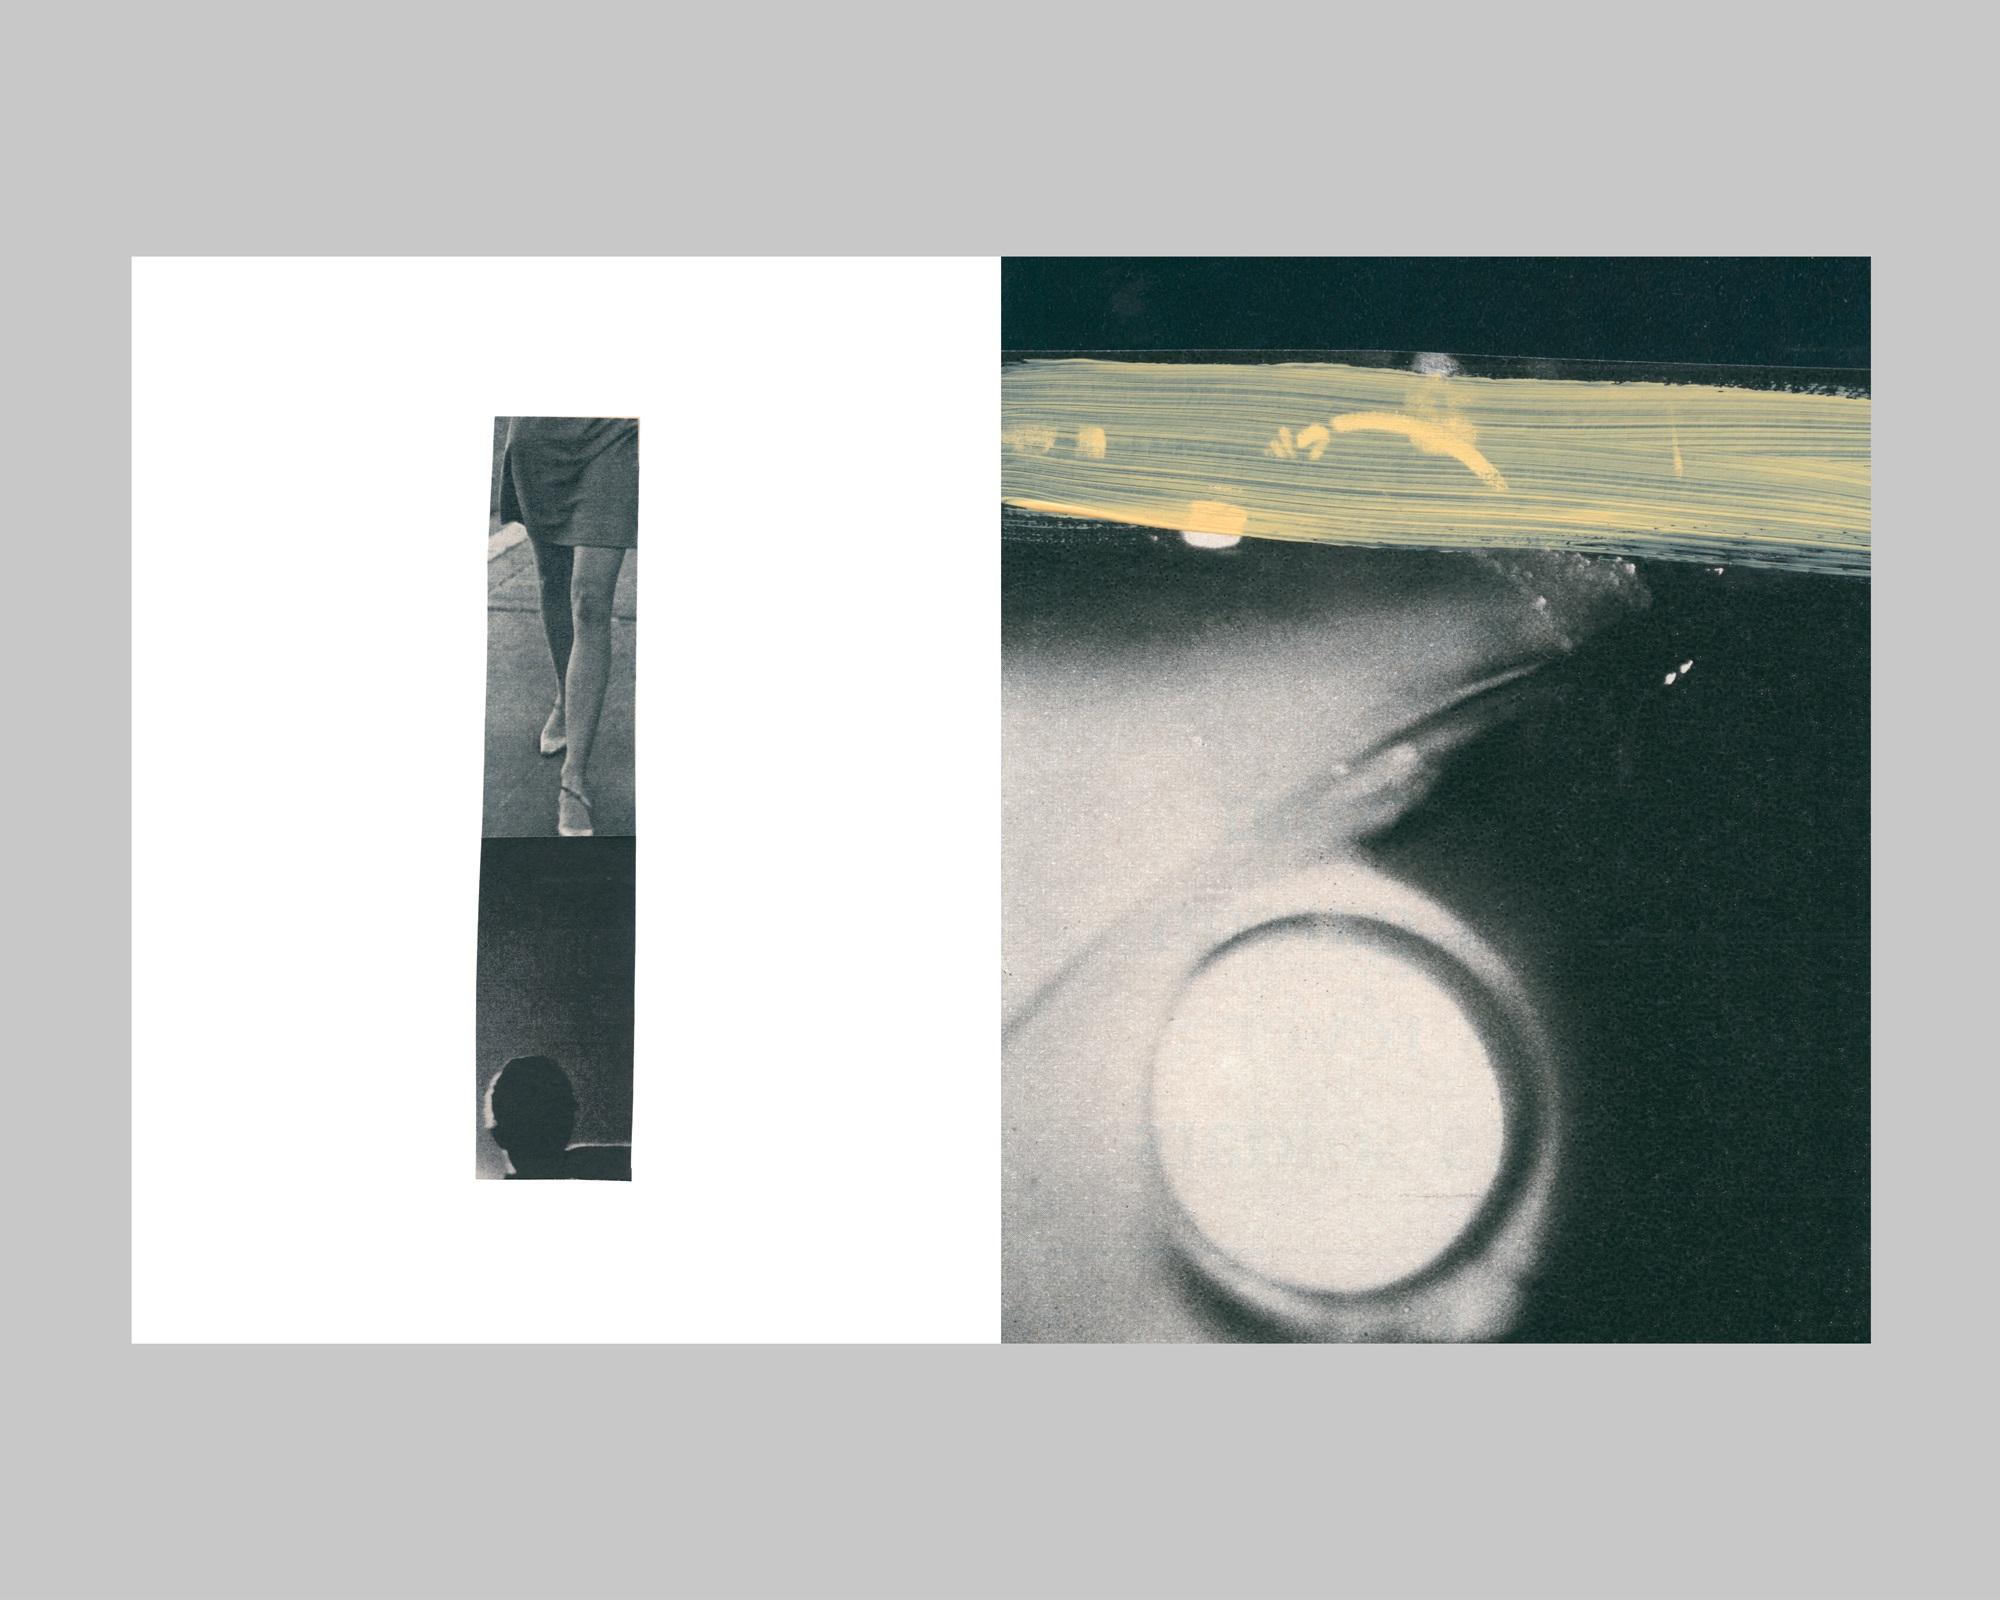 LM-Katrien-De-Blauwer-Why-I-Hate-Cars-14.jpg